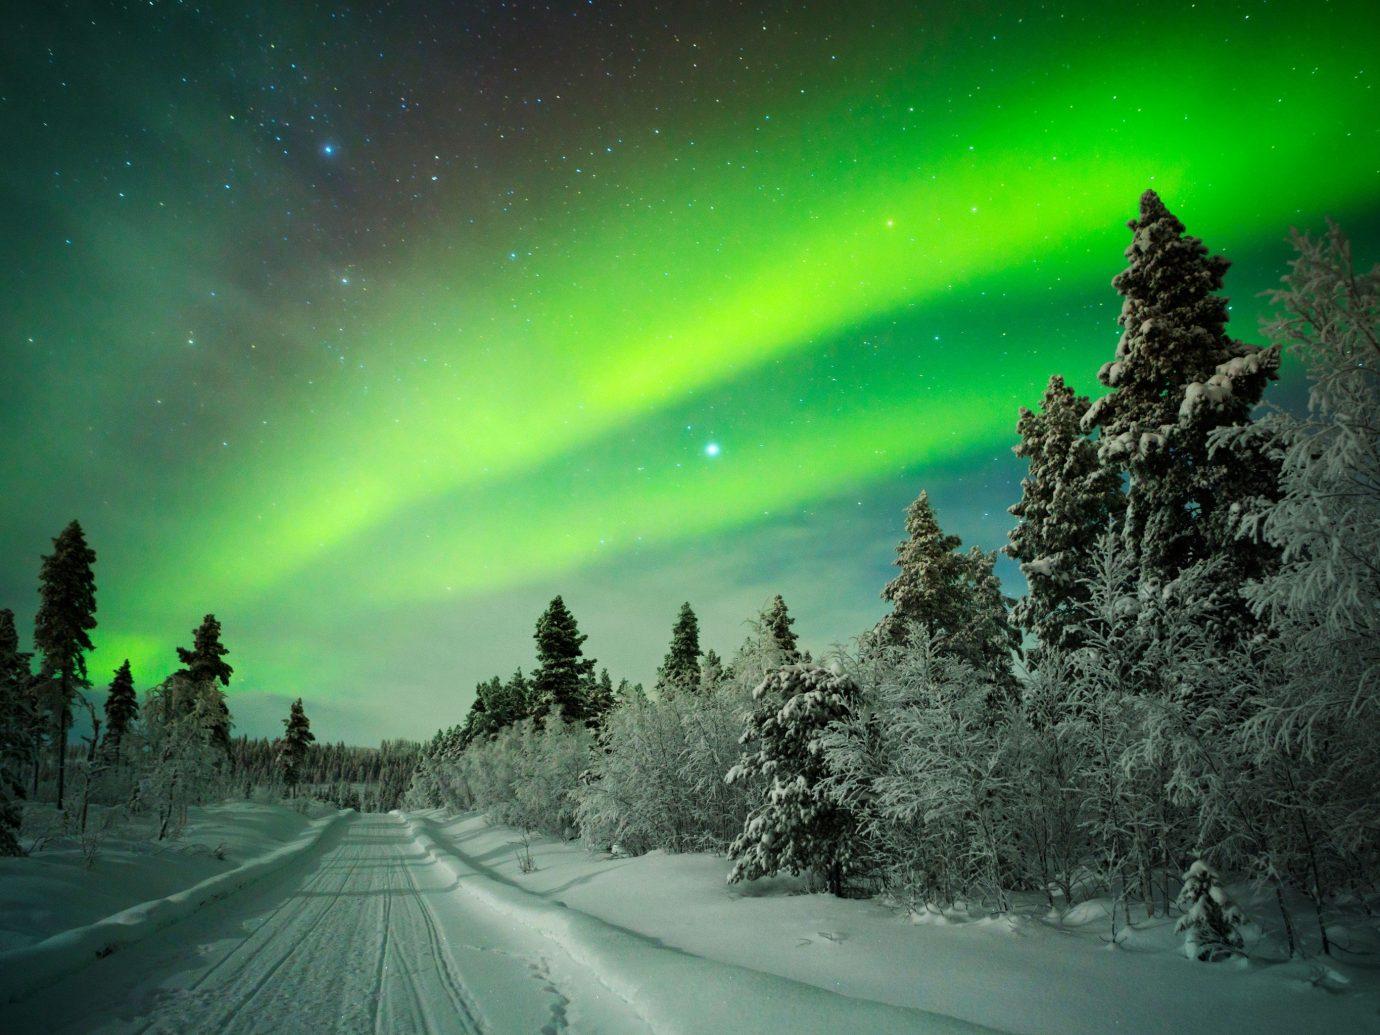 Trip Ideas tree outdoor aurora weather night atmosphere Nature midnight bright Night Sky